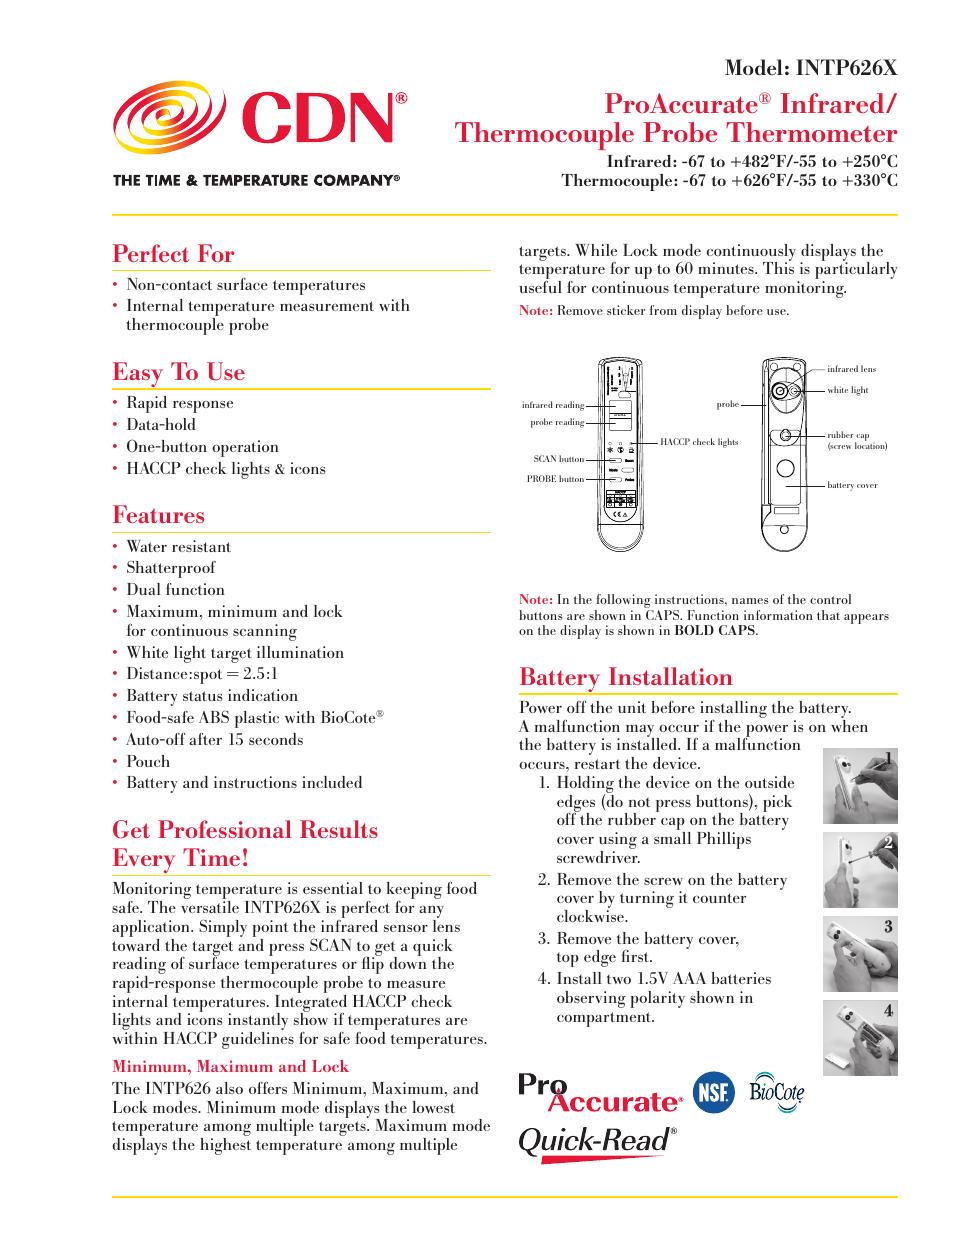 CDN INTP626X - ProAccurate® Infrared/Thermocouple Probe